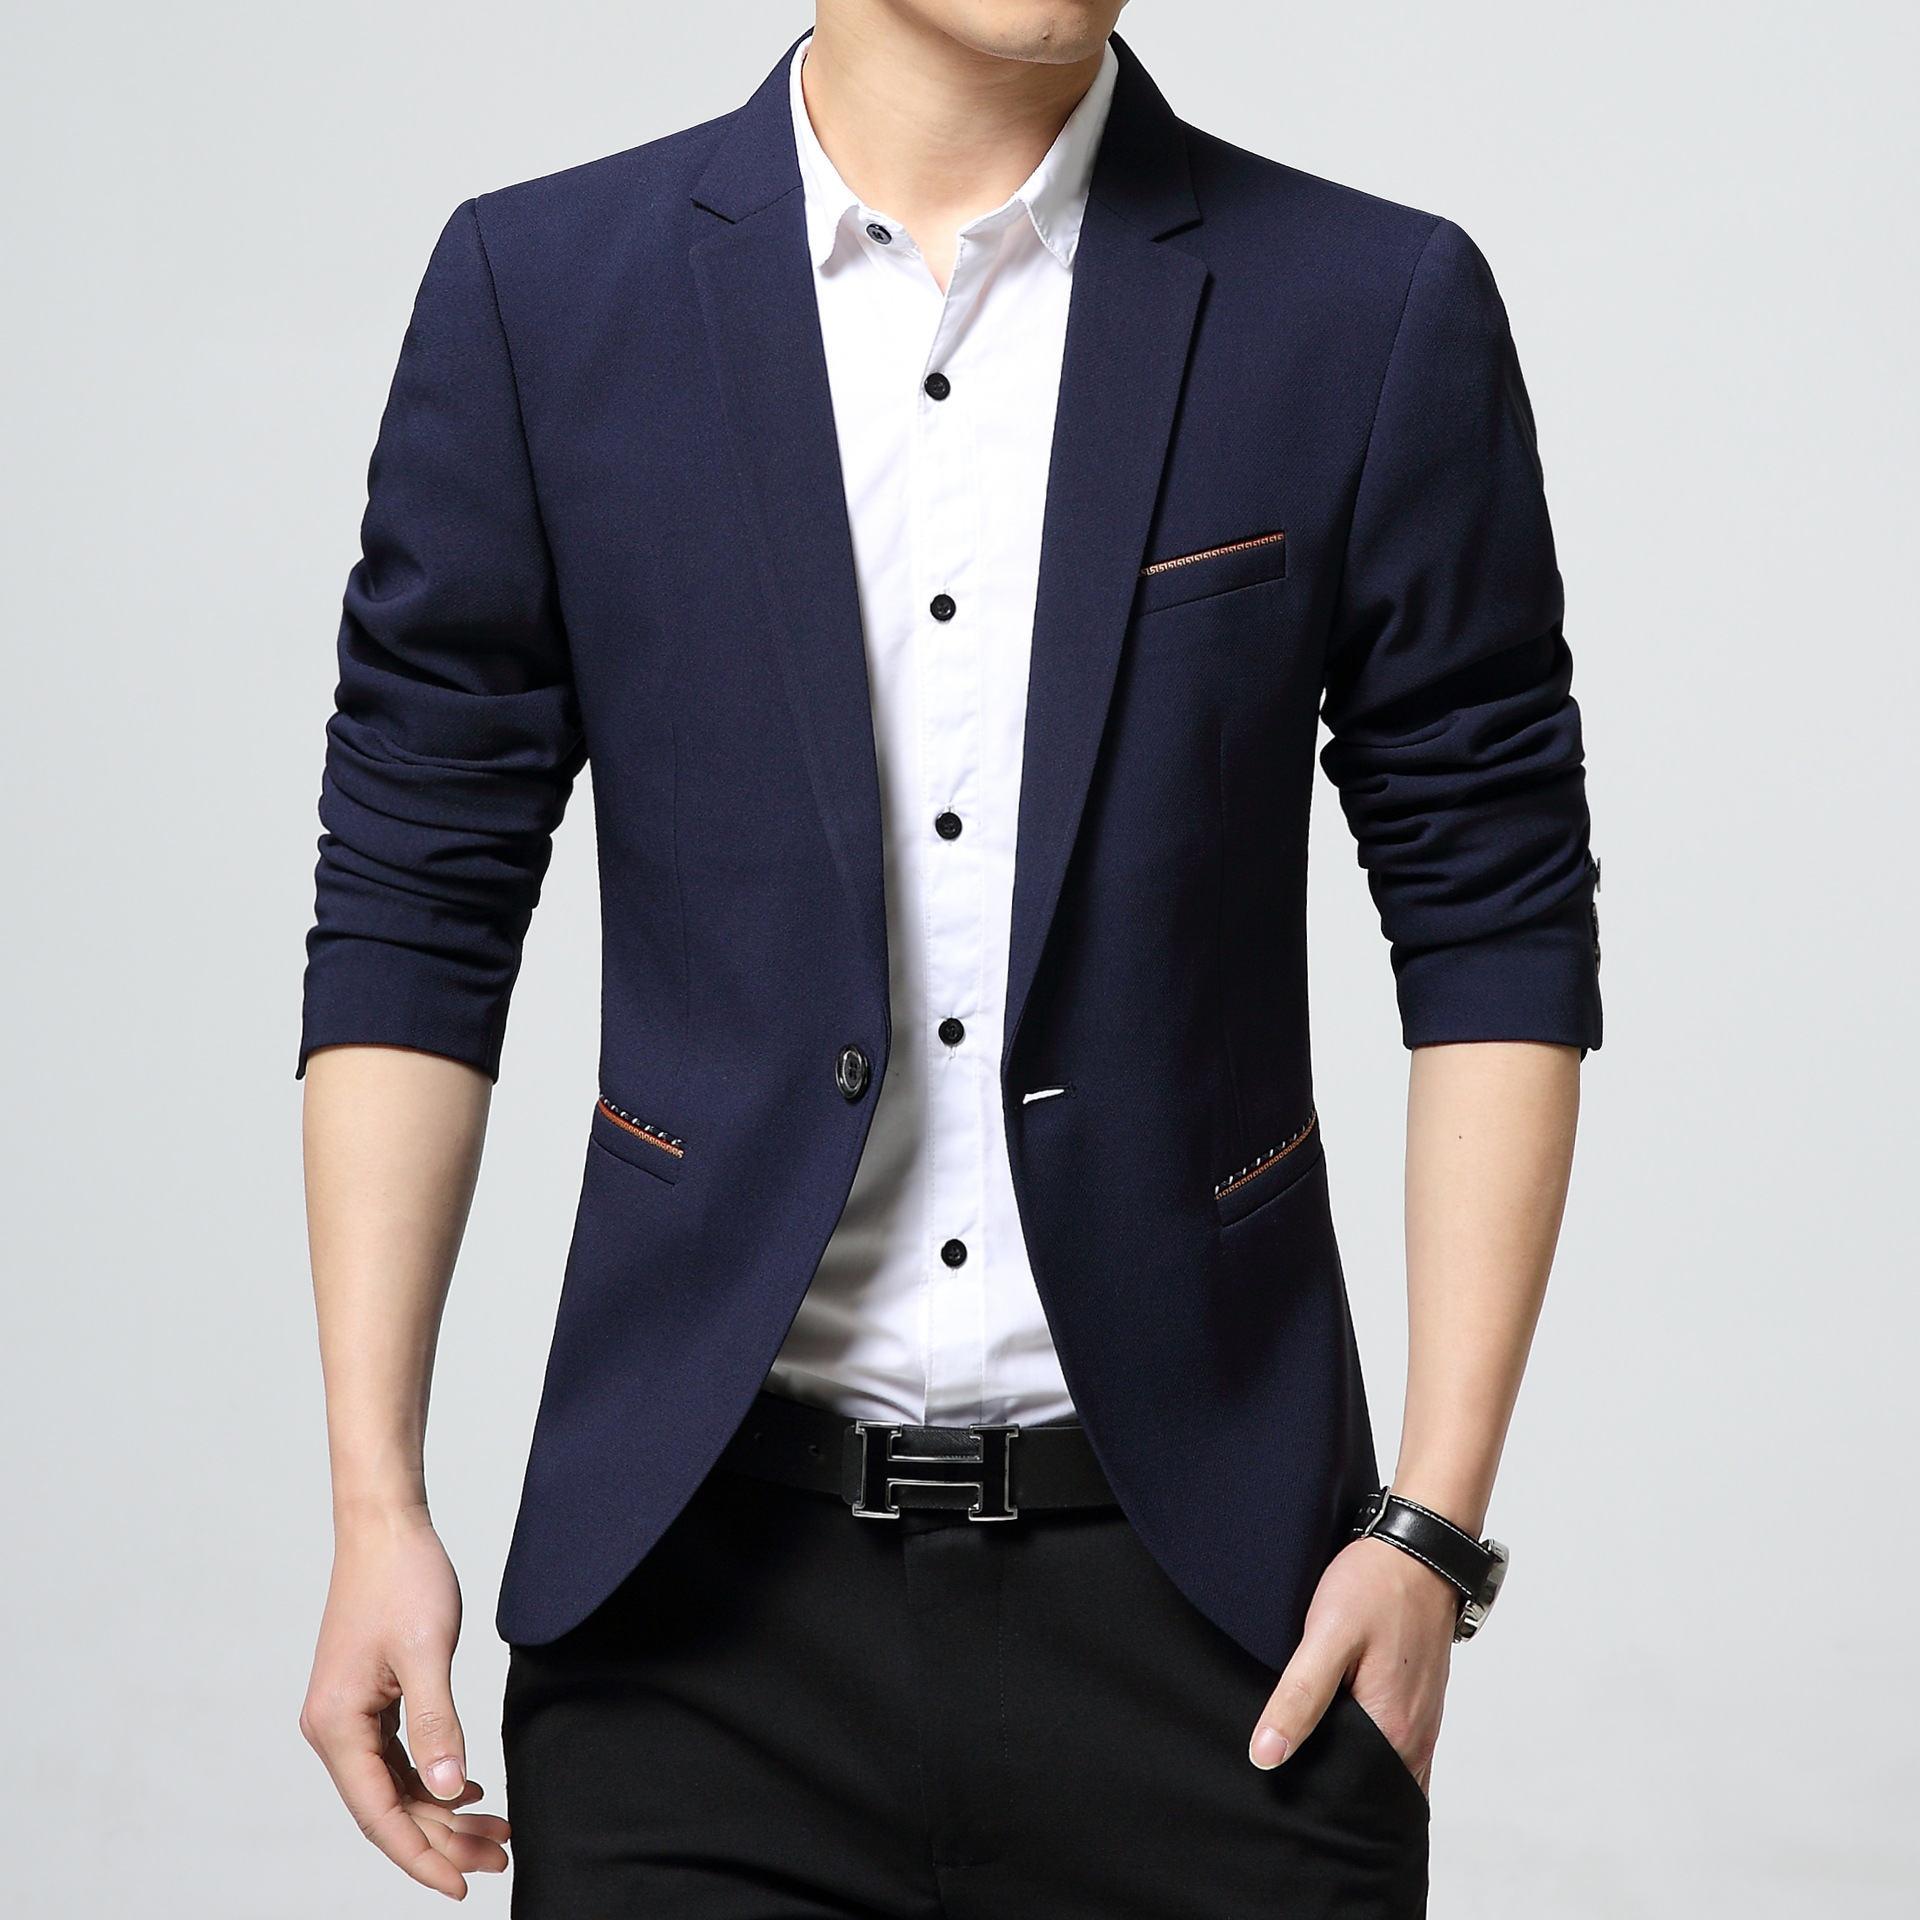 Latest Coat Design Wedding Dress For Men Casual Blazer Suit Jacket Men Party Wear Korean Suit Slim Fit Mens Blazers New Arrivals мужские кожанные куртки с косой молнией